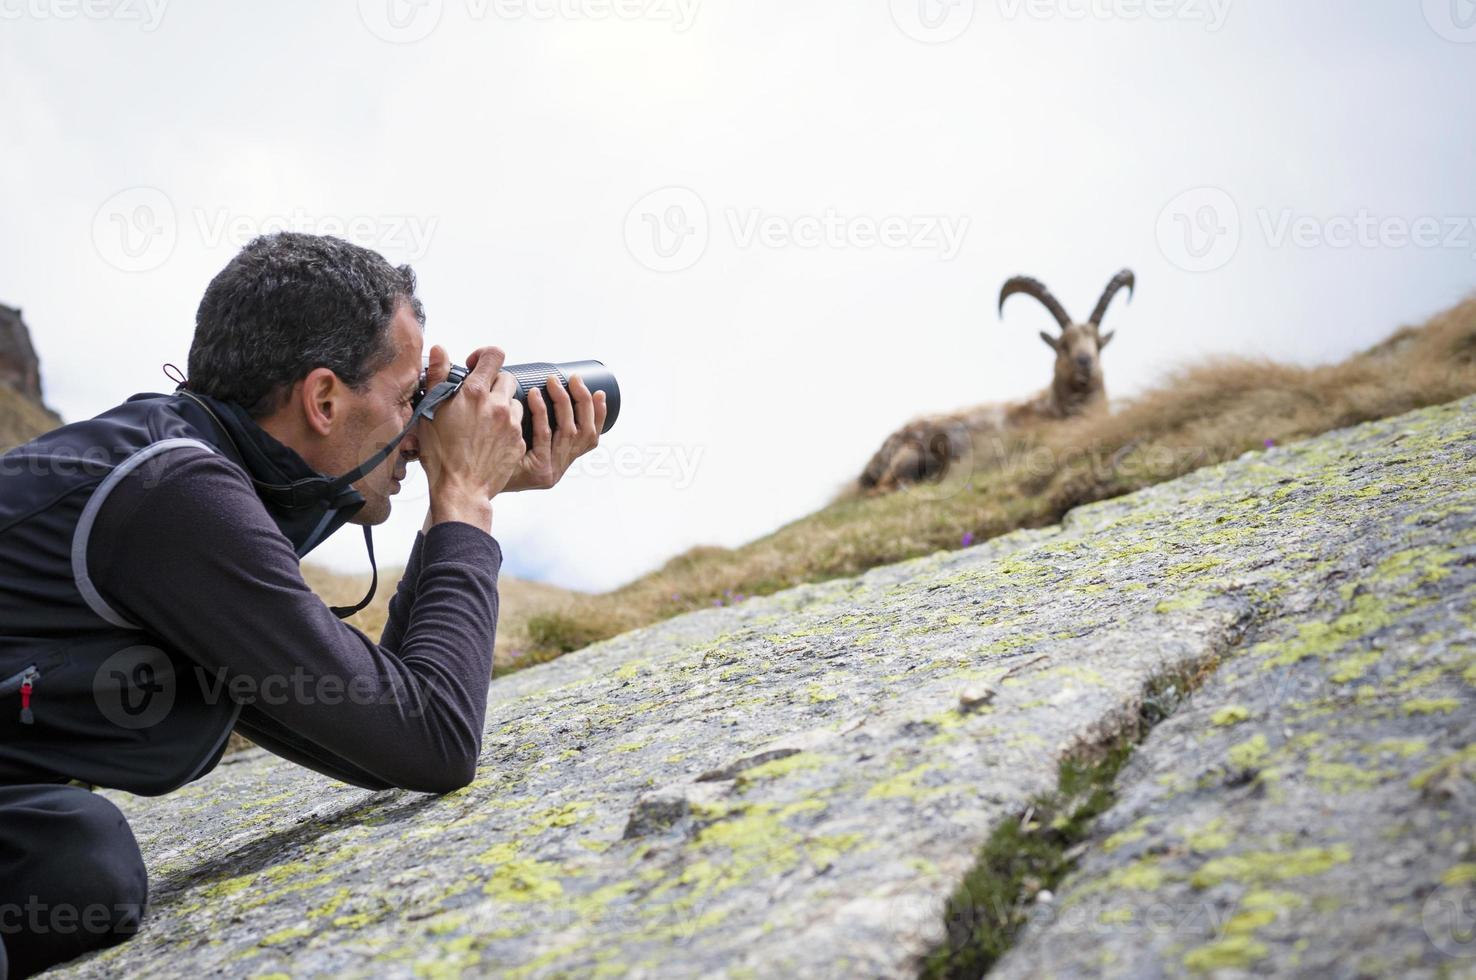 fotografo naturalista foto